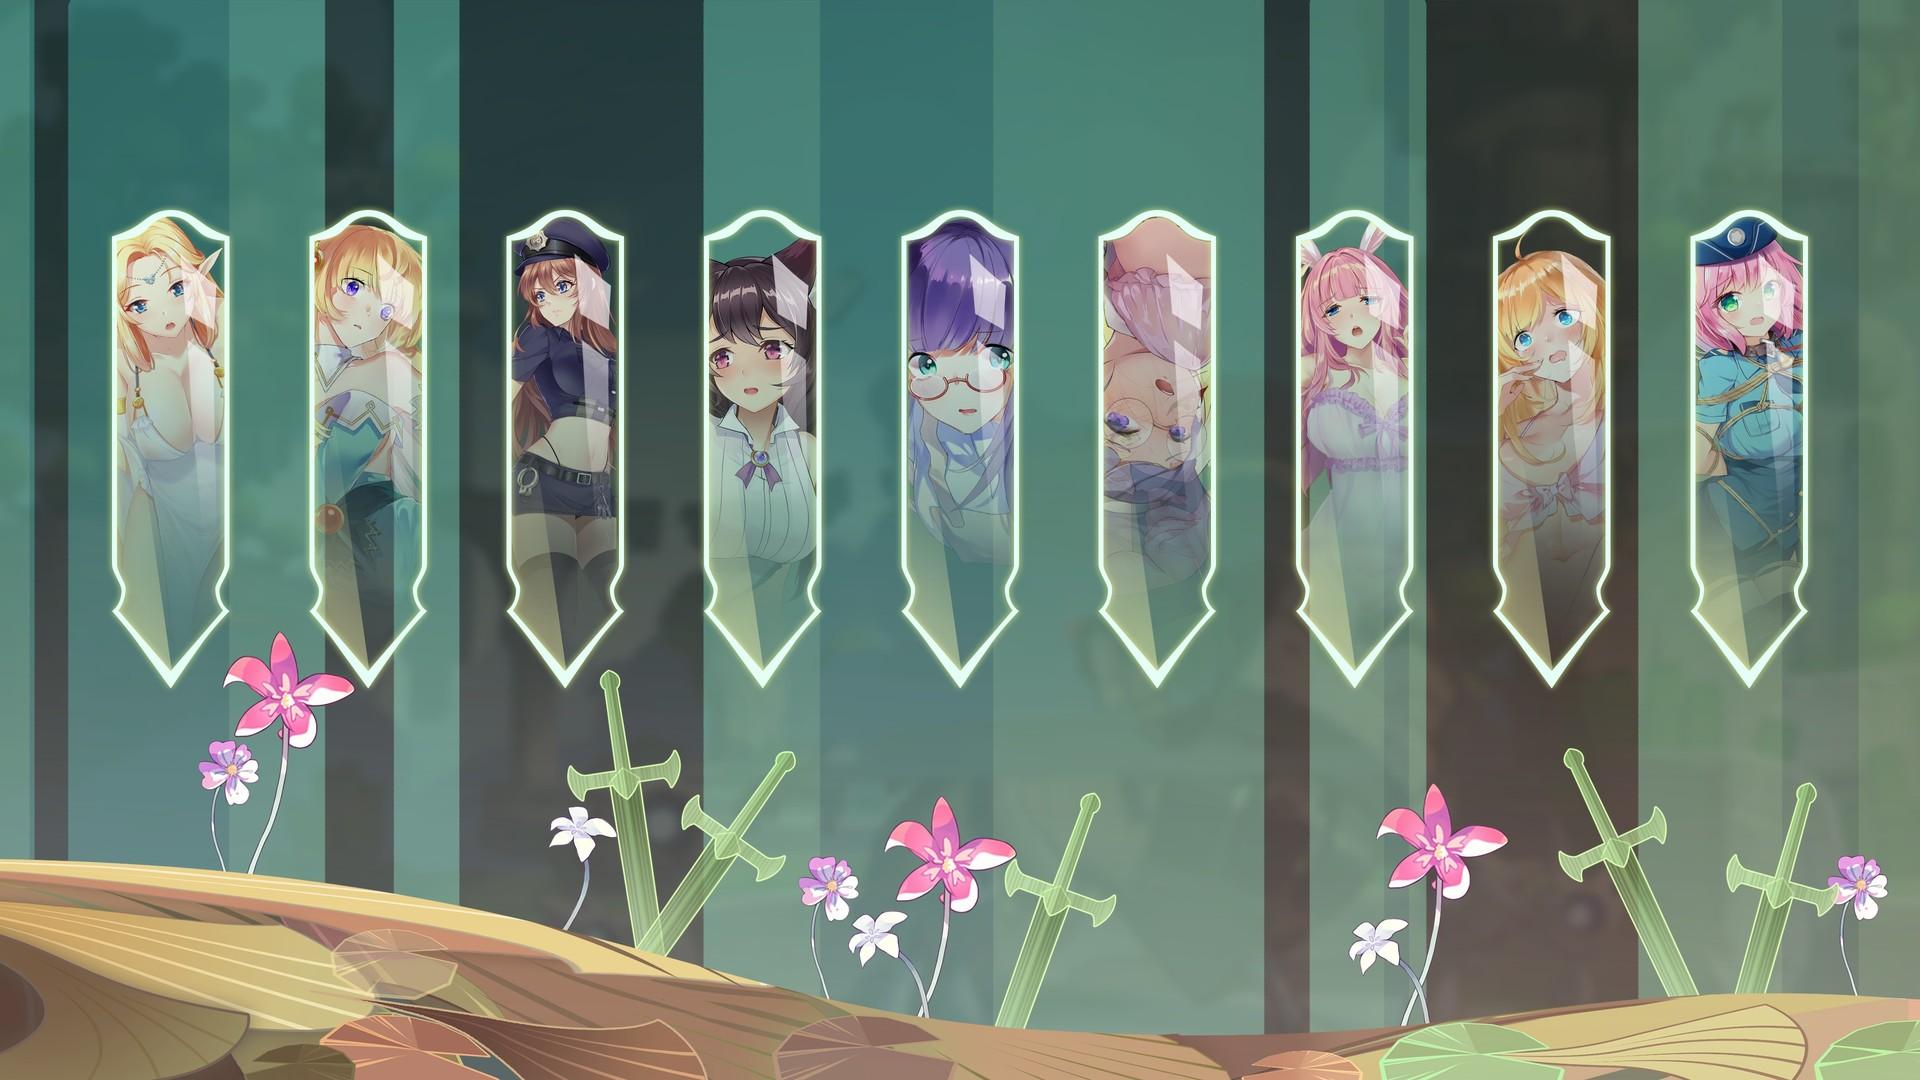 【Steam】18禁遊戲《Lost》&《Seek Girl Ⅱ》銅板價組合包!比手搖杯還便宜!